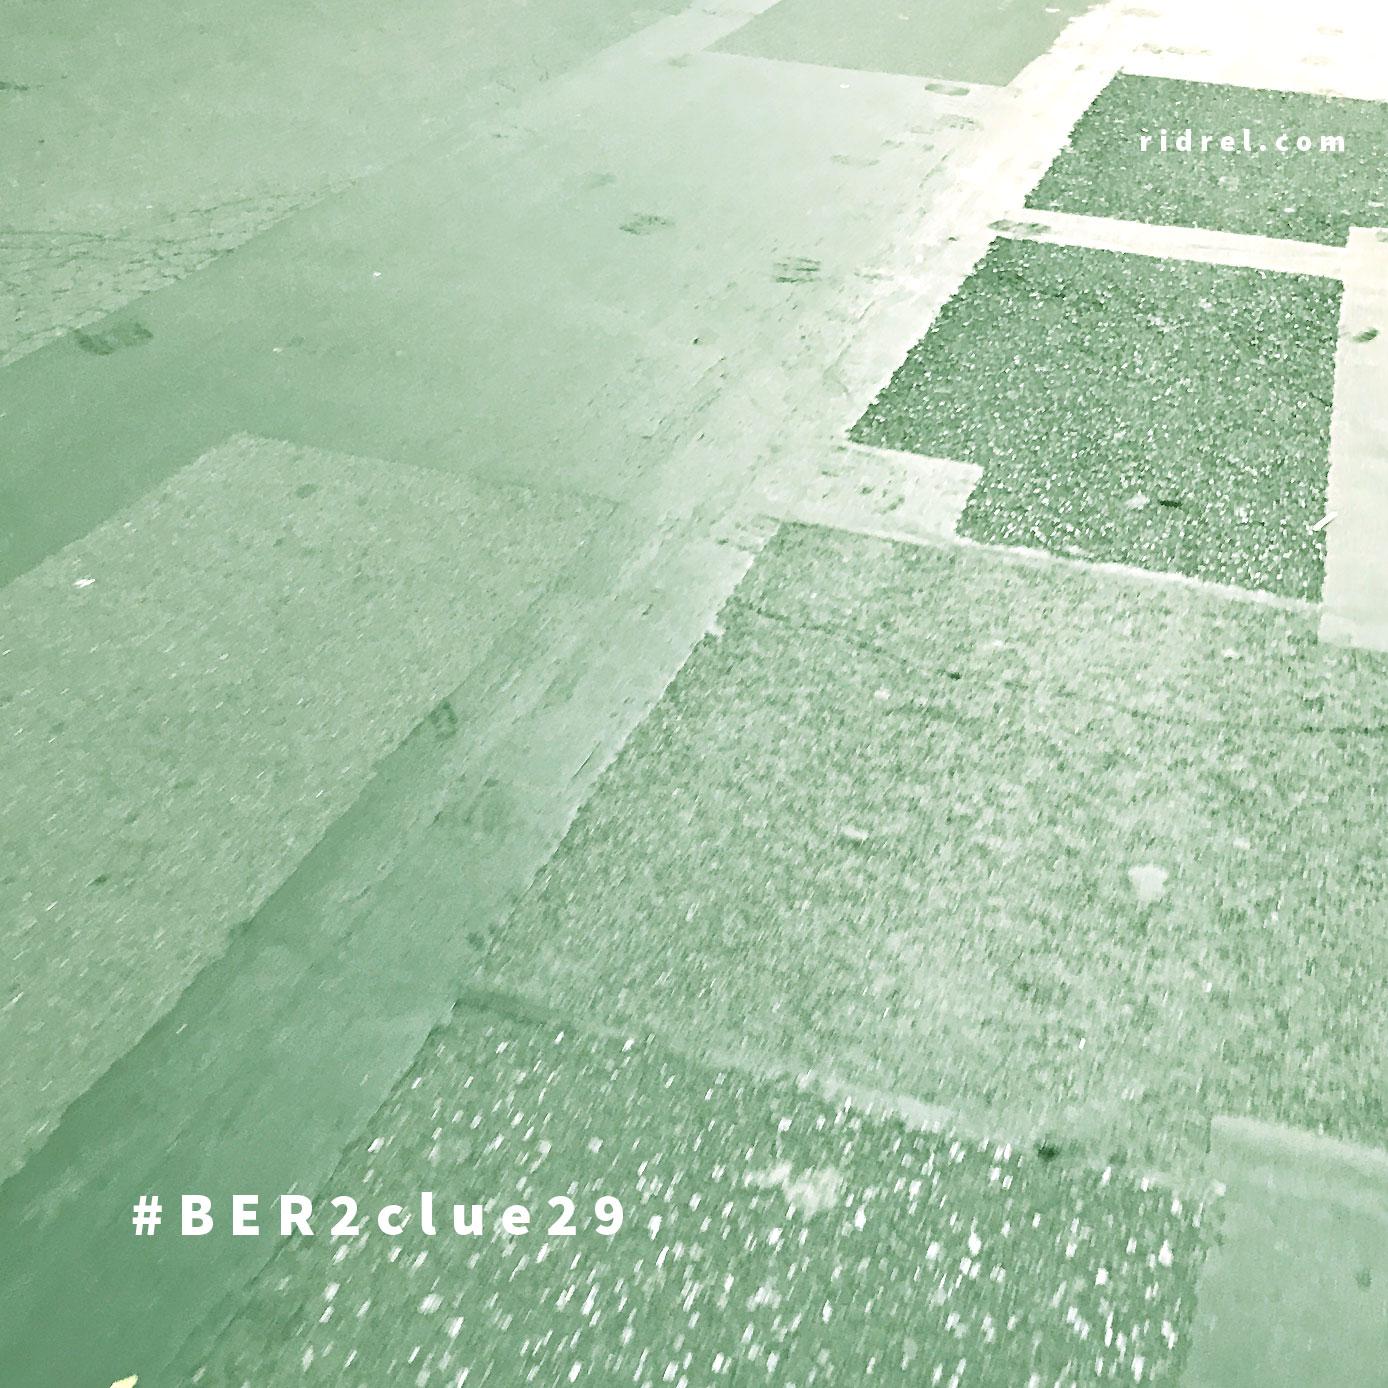 29.clue_ridrelB2.jpg